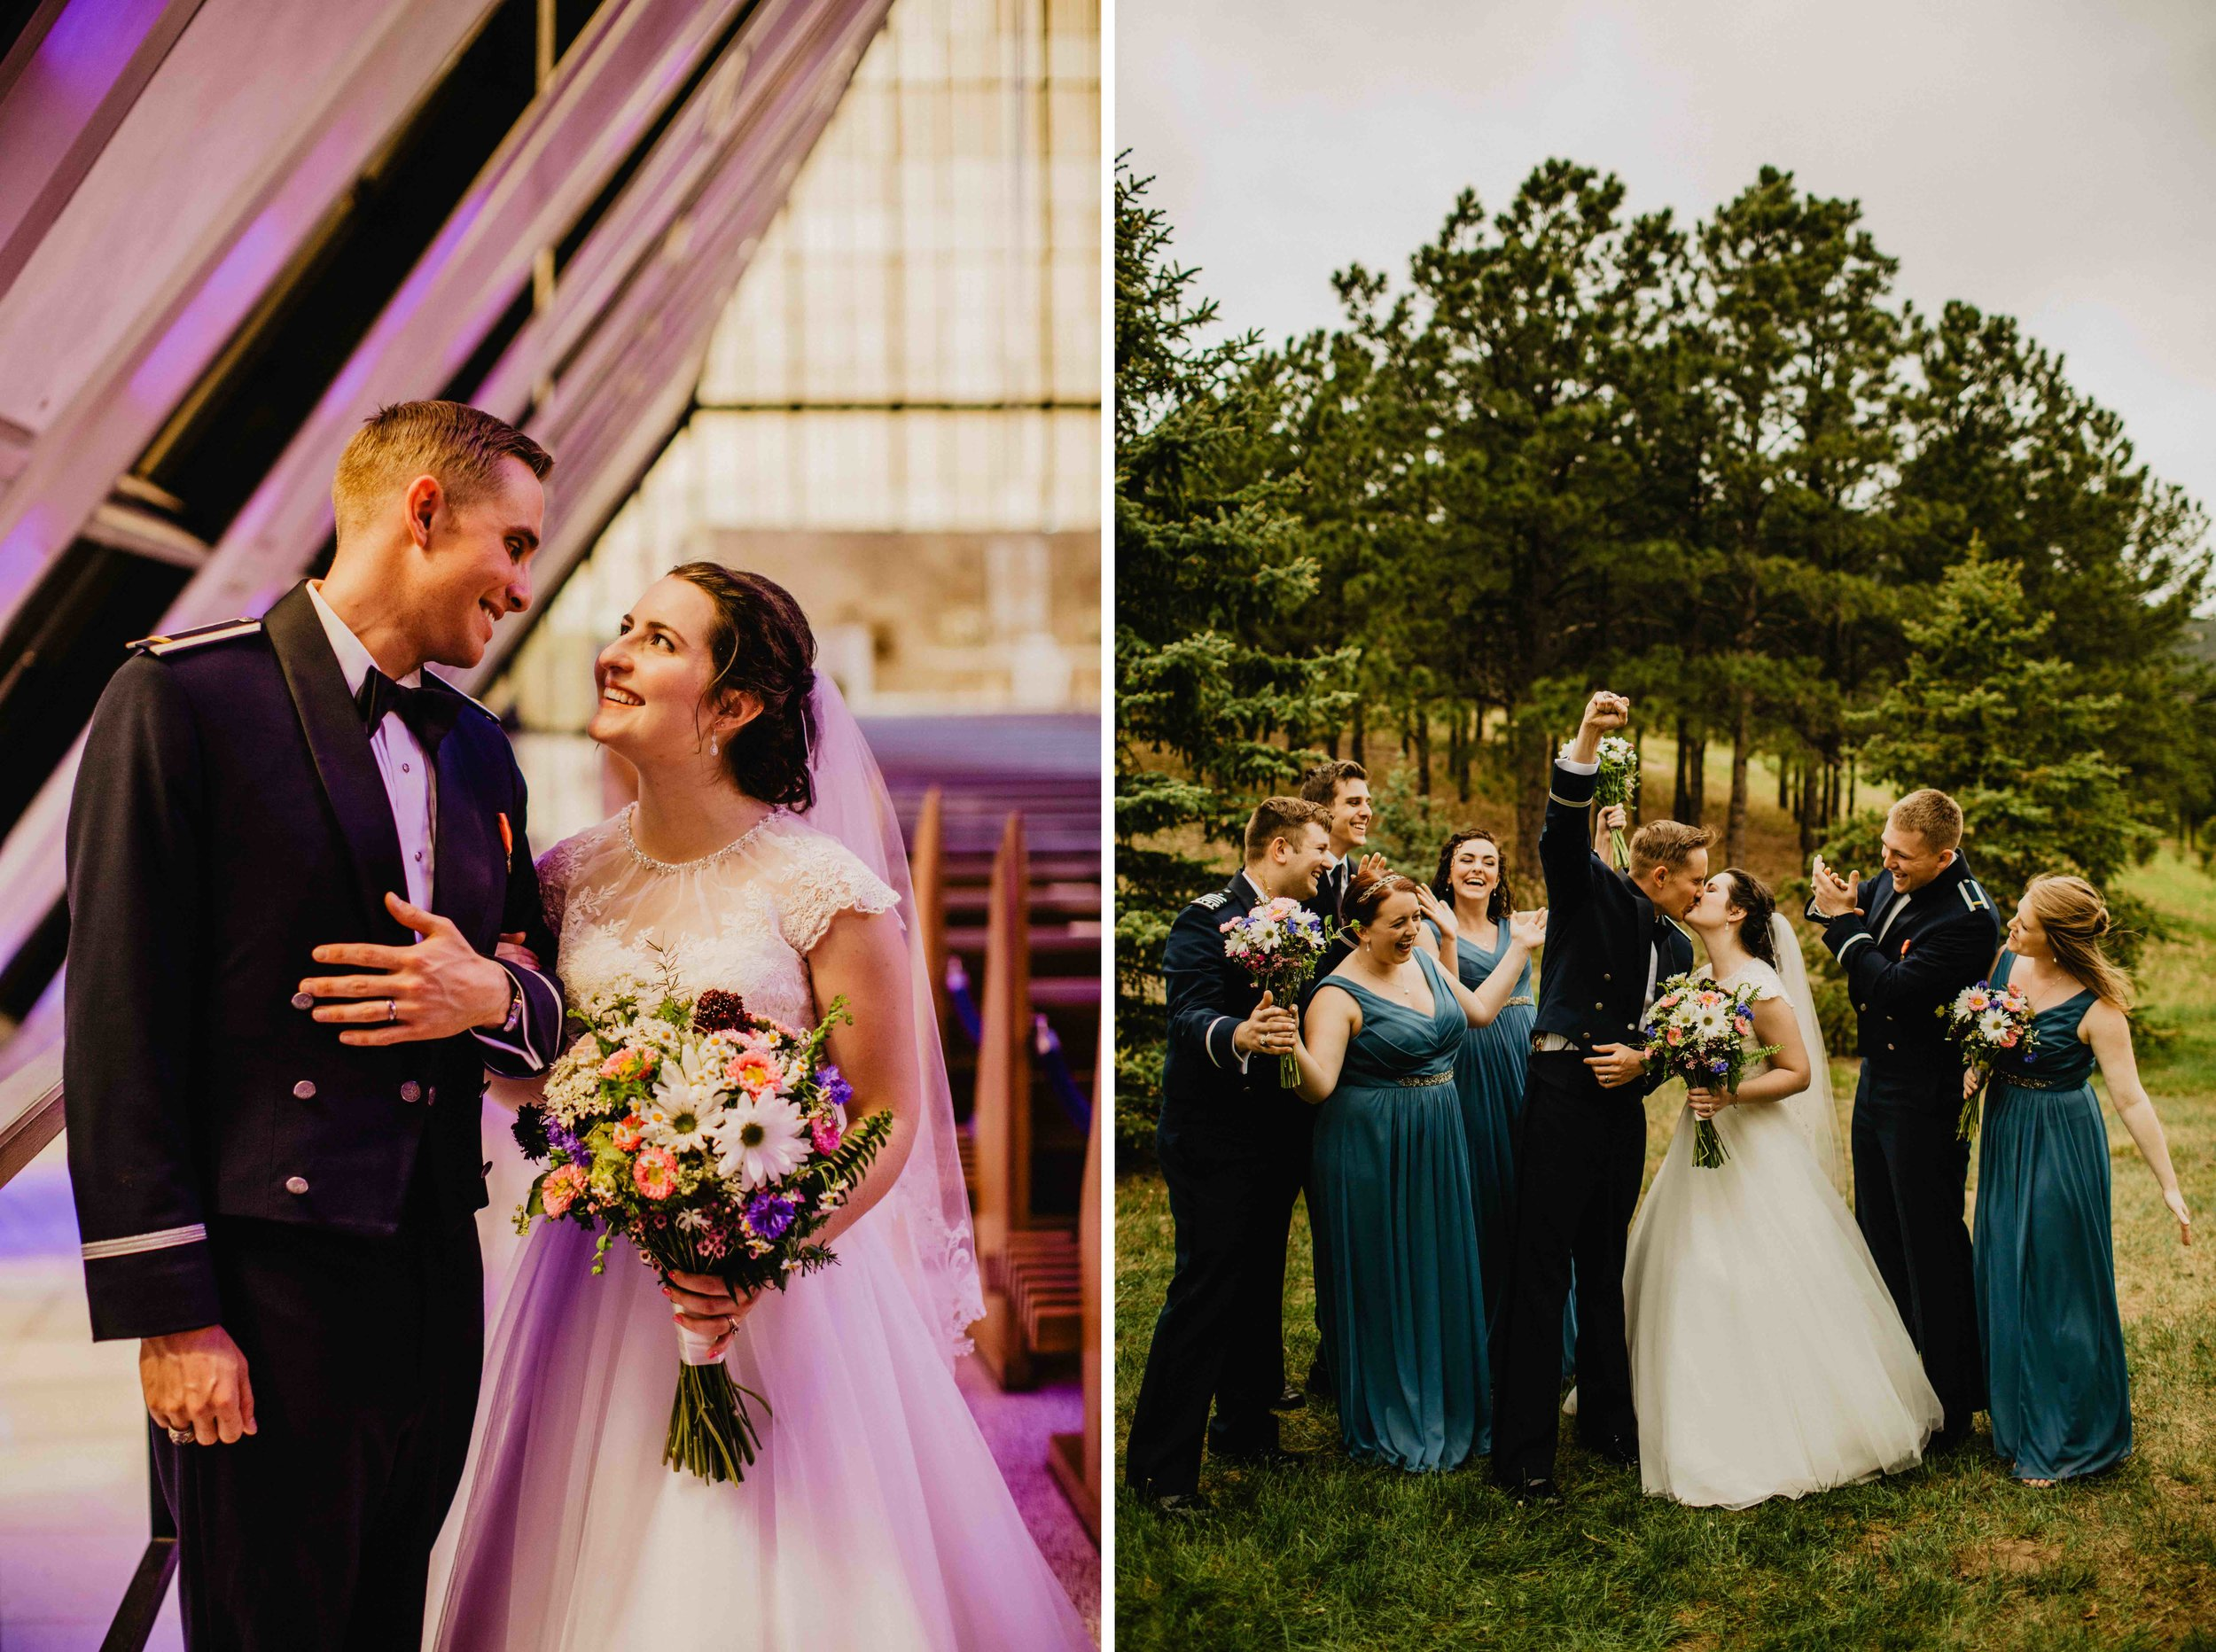 607A5788 copy-colorado-wedding-photographer-denver-springs-vail--colorado-wedding-photographer-denver-springs-vail-.jpeg